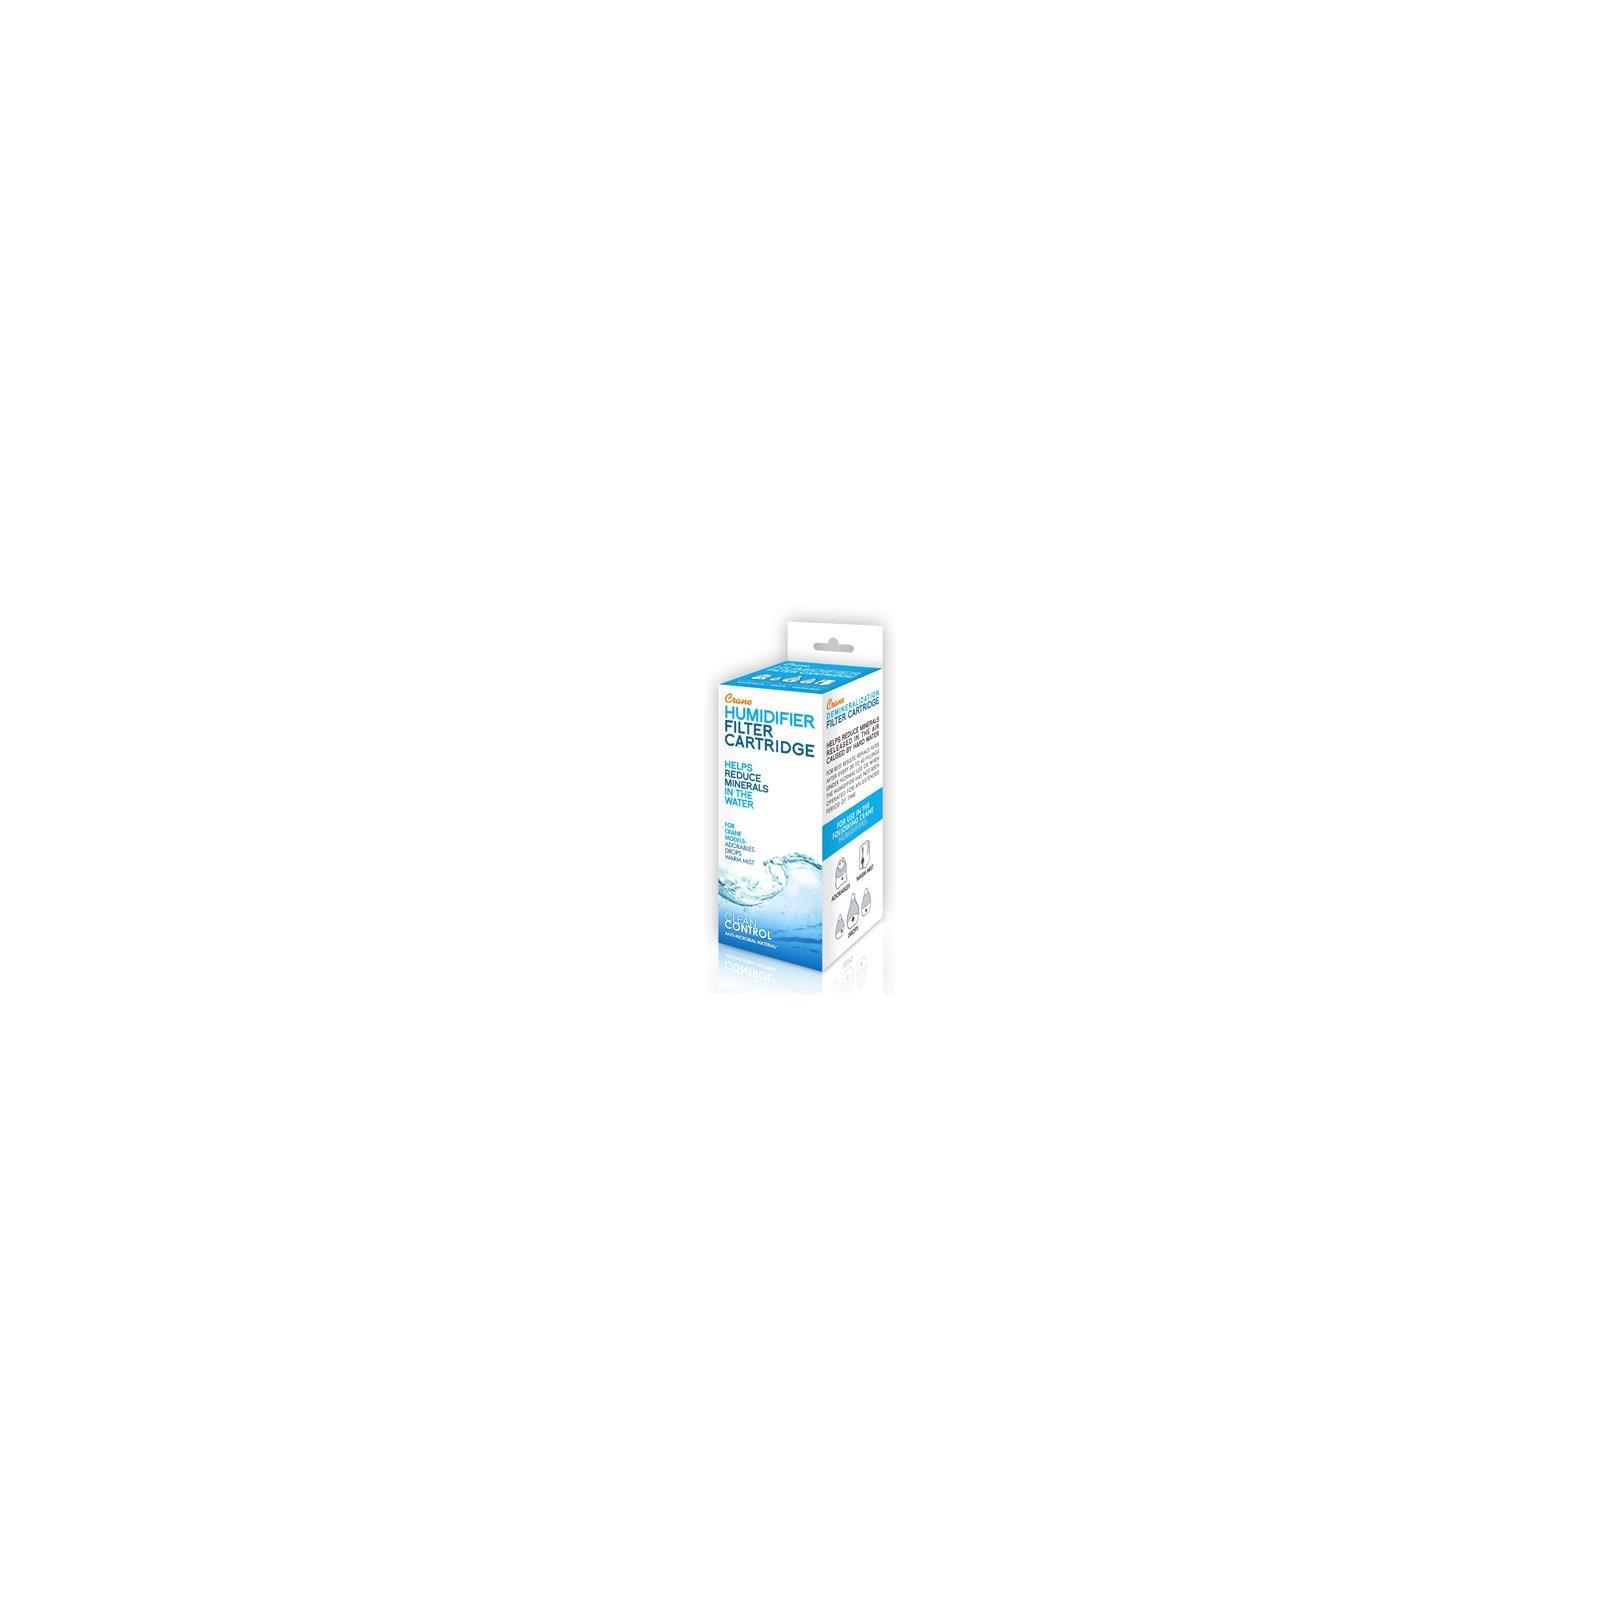 Crane Usa HS-1932 Animal-Shape Humidifier Filter - Quantity 6